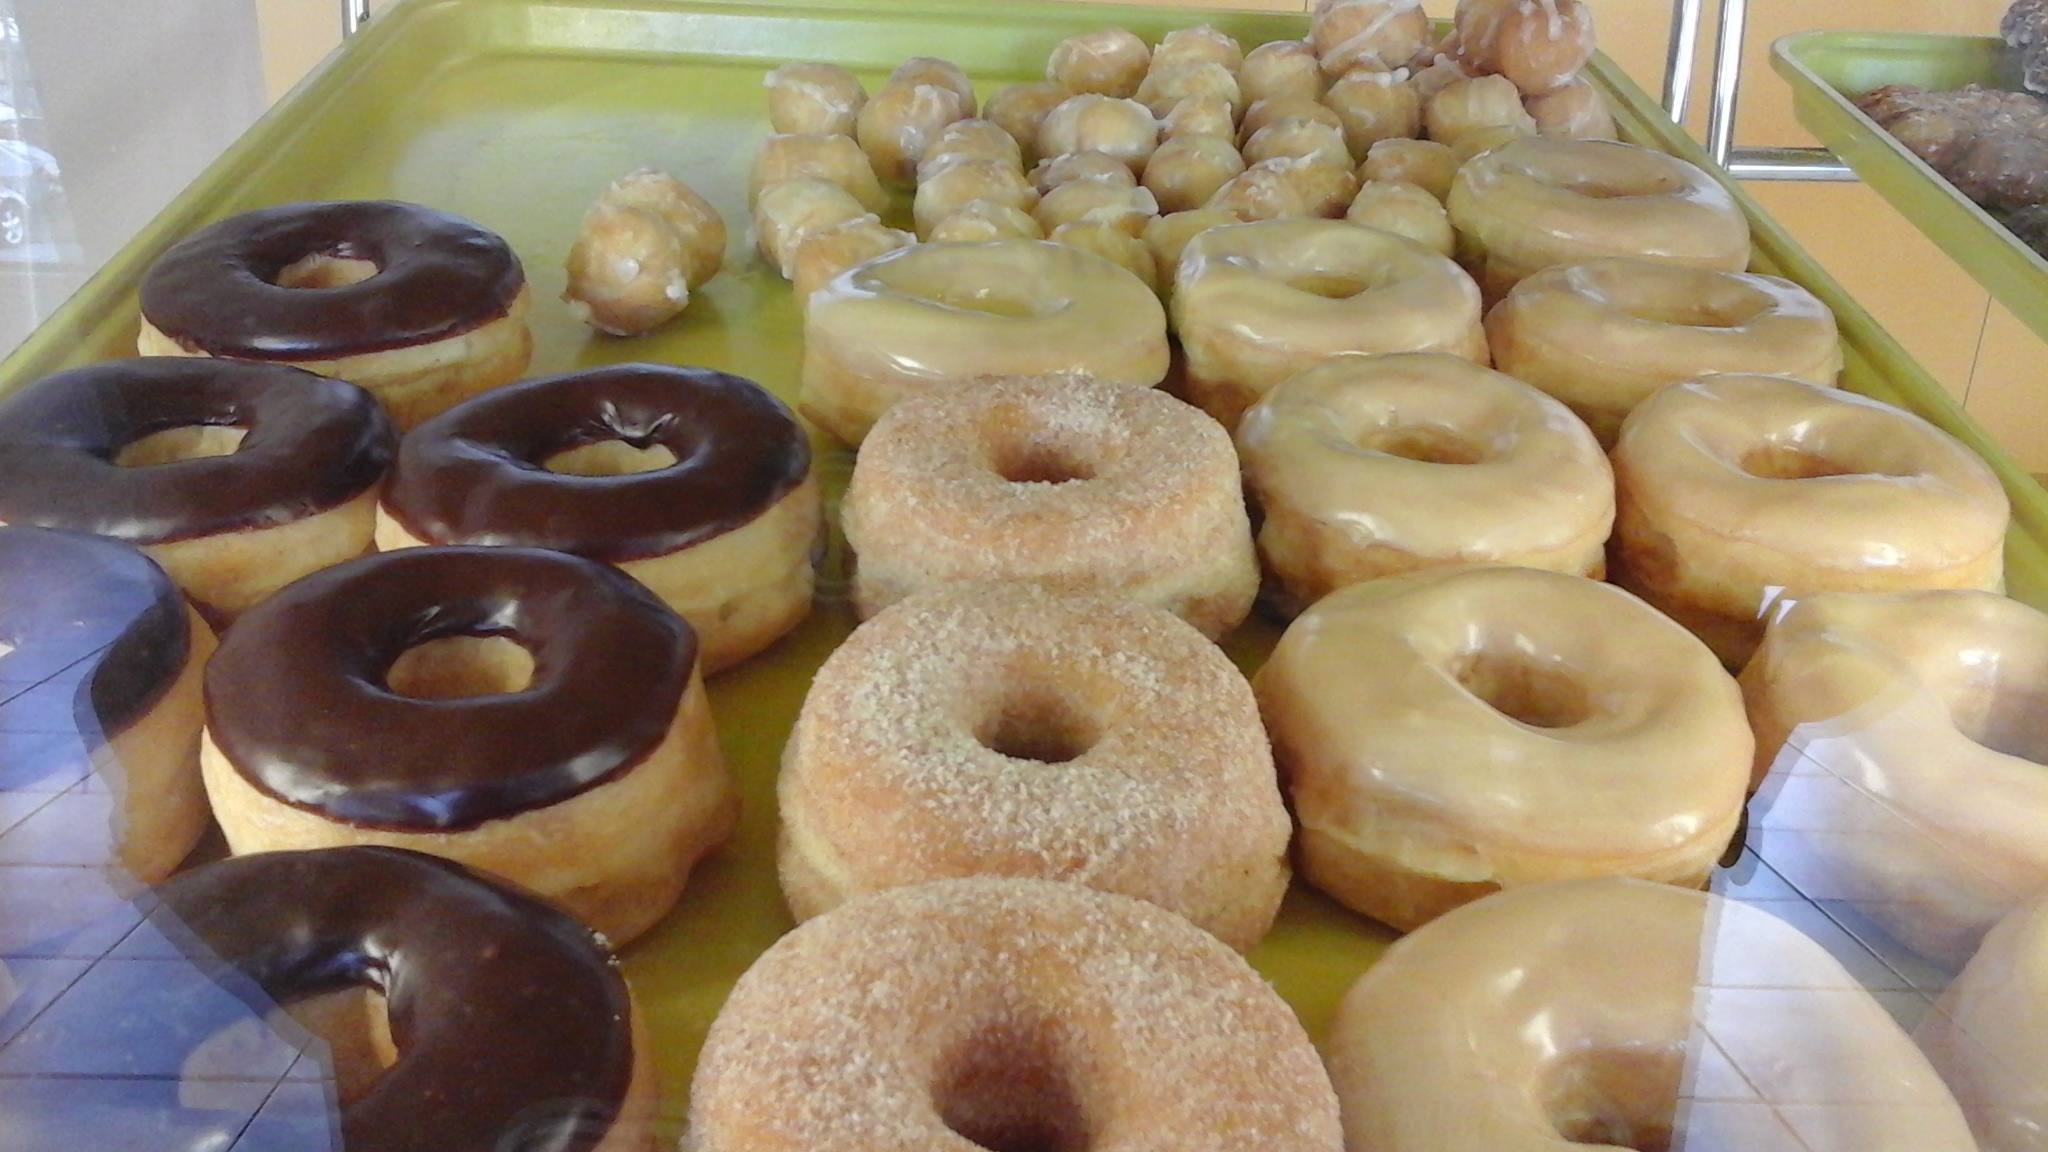 Daylight Donuts image 4